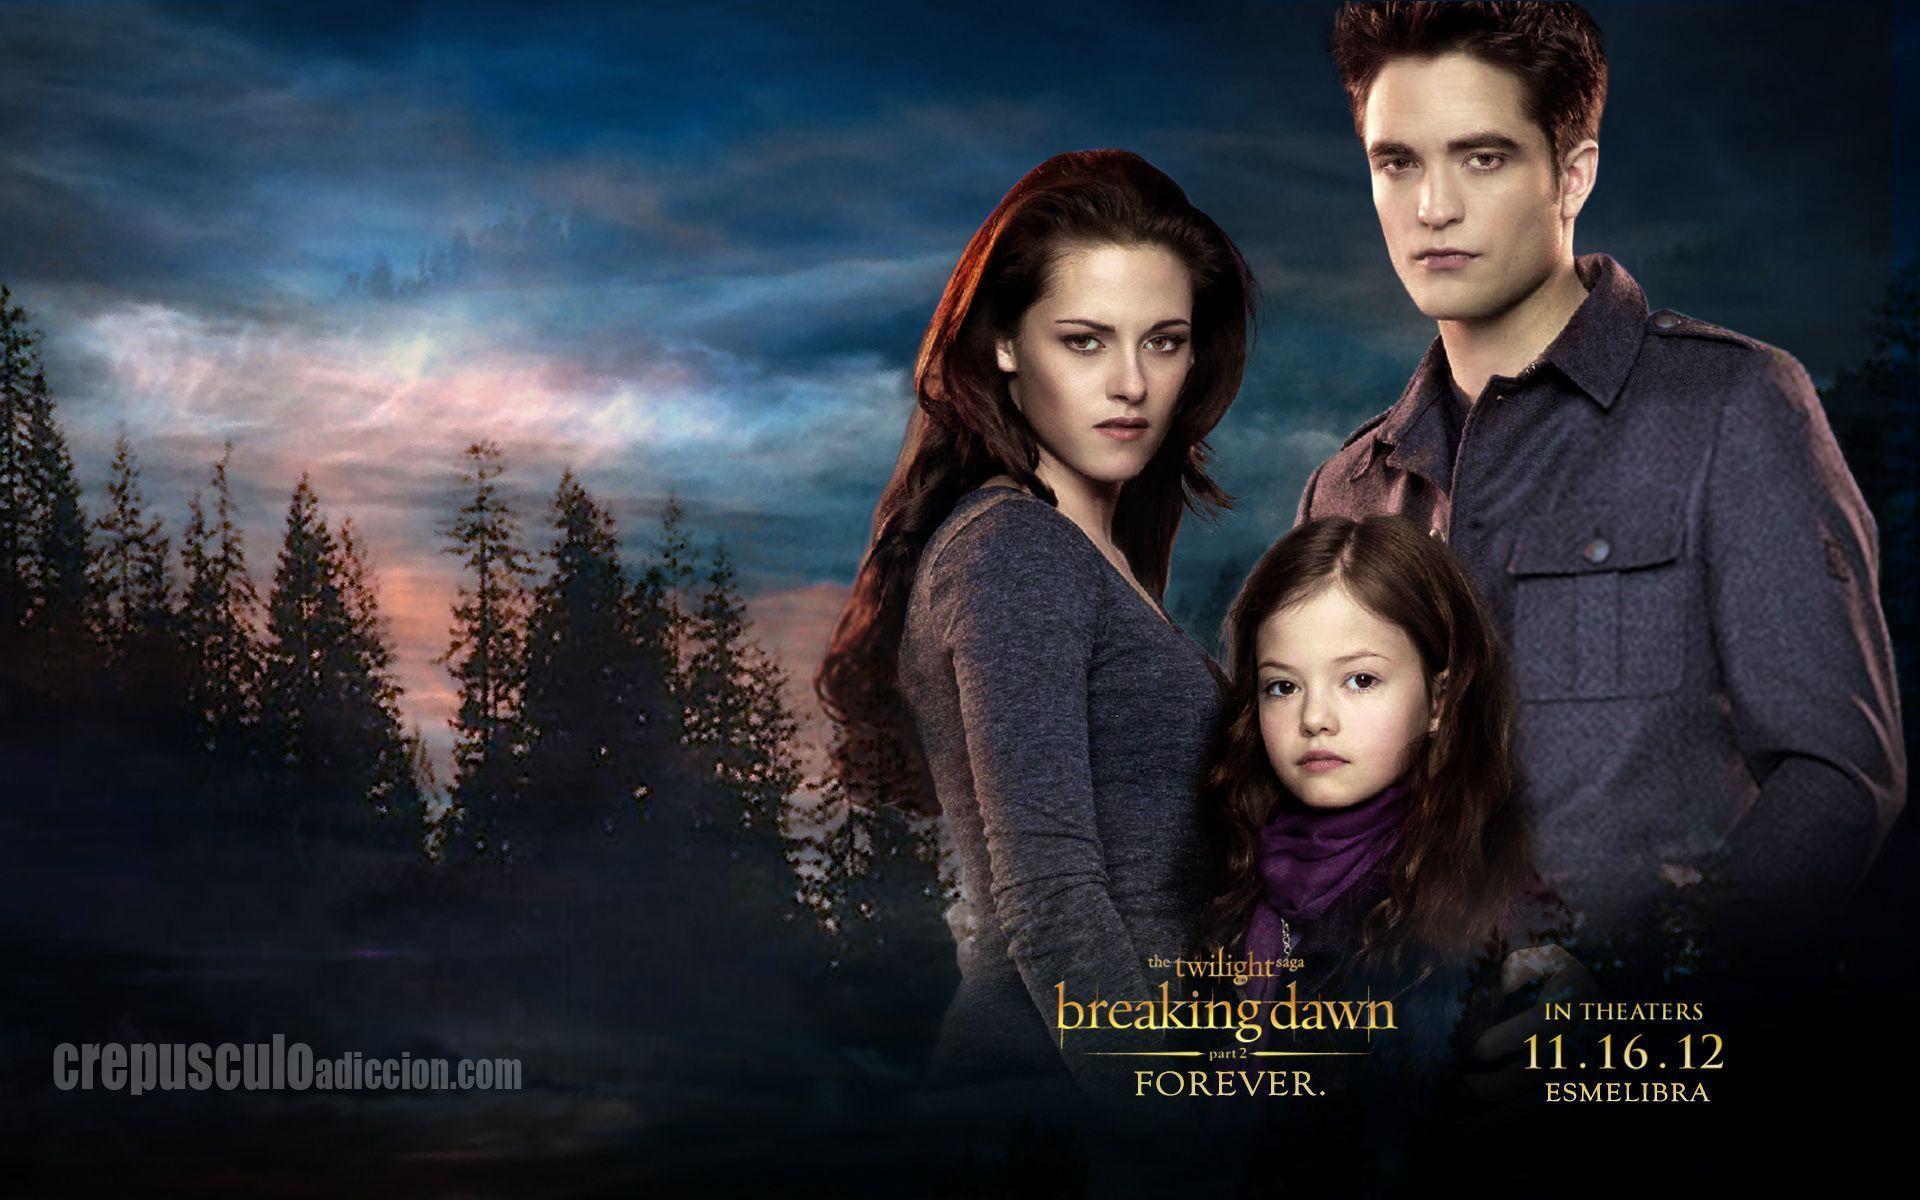 the twilight saga breaking dawn - part 2 (2012) free download